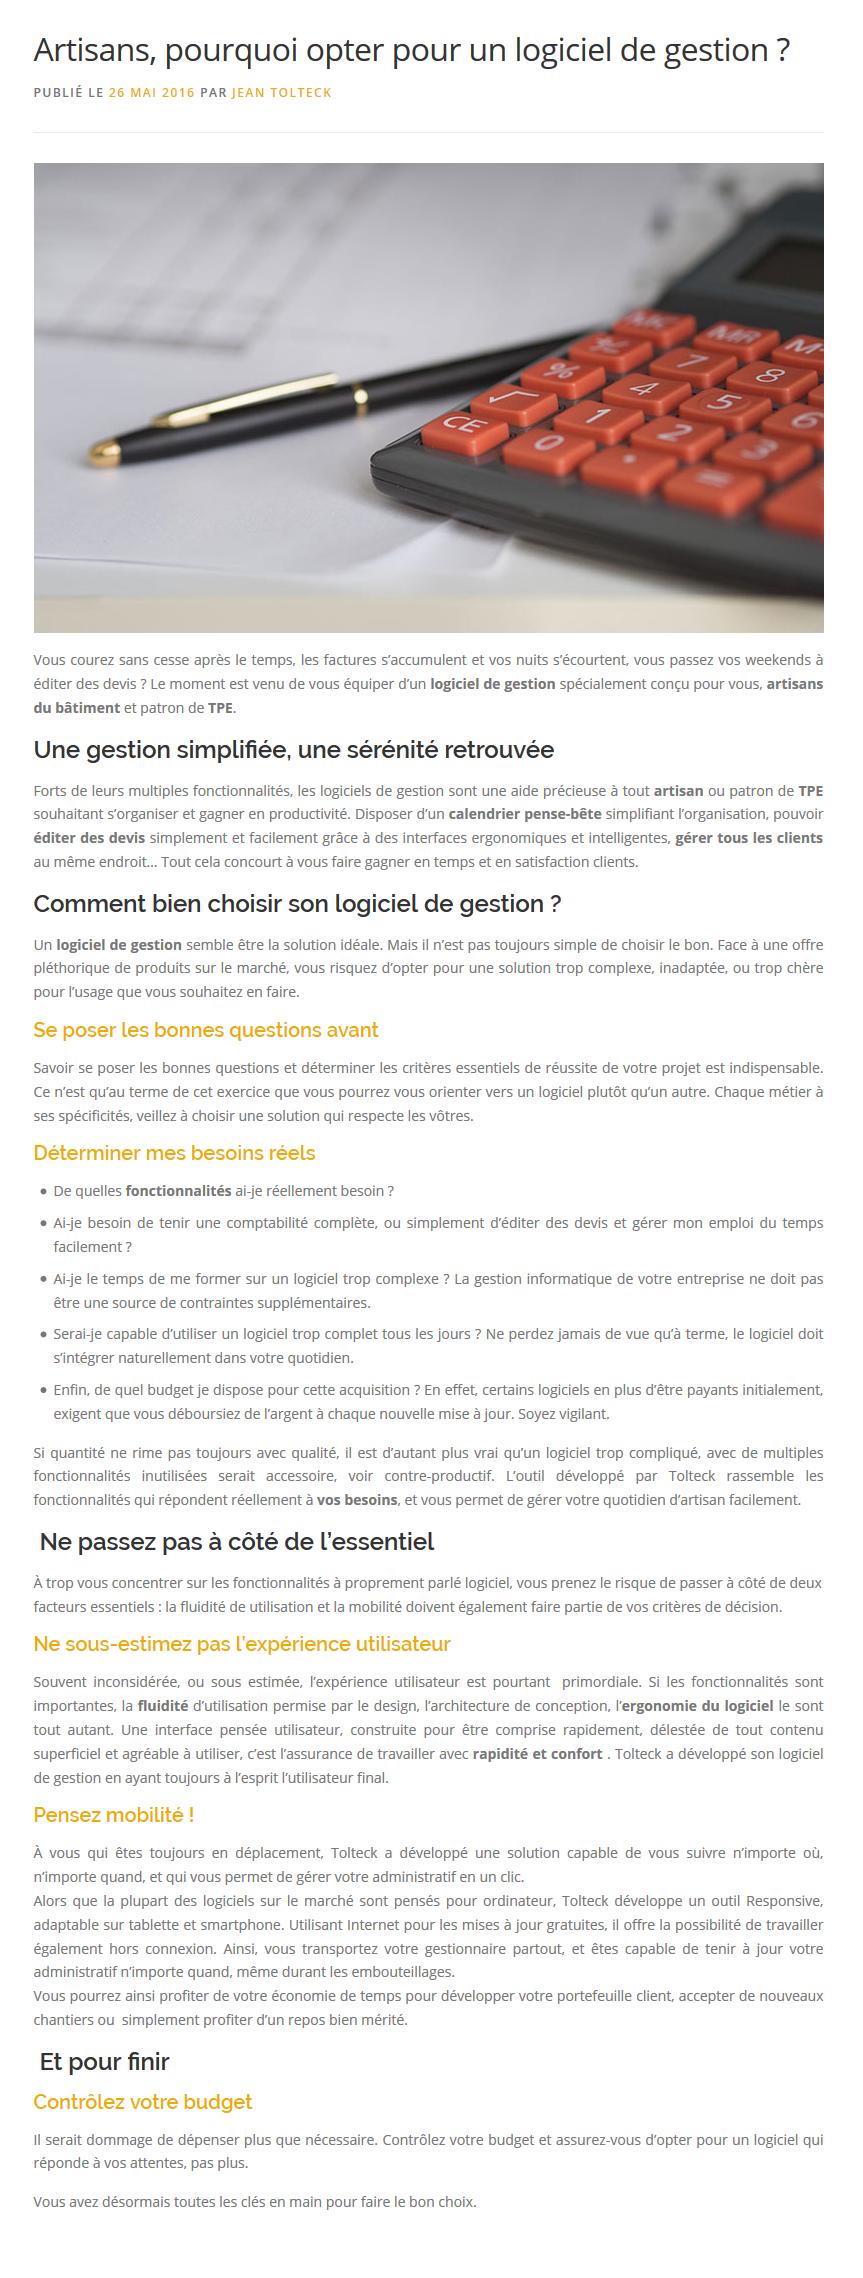 alysee-flaut-redaction-article-optimise-pour-le-seo-tolteck